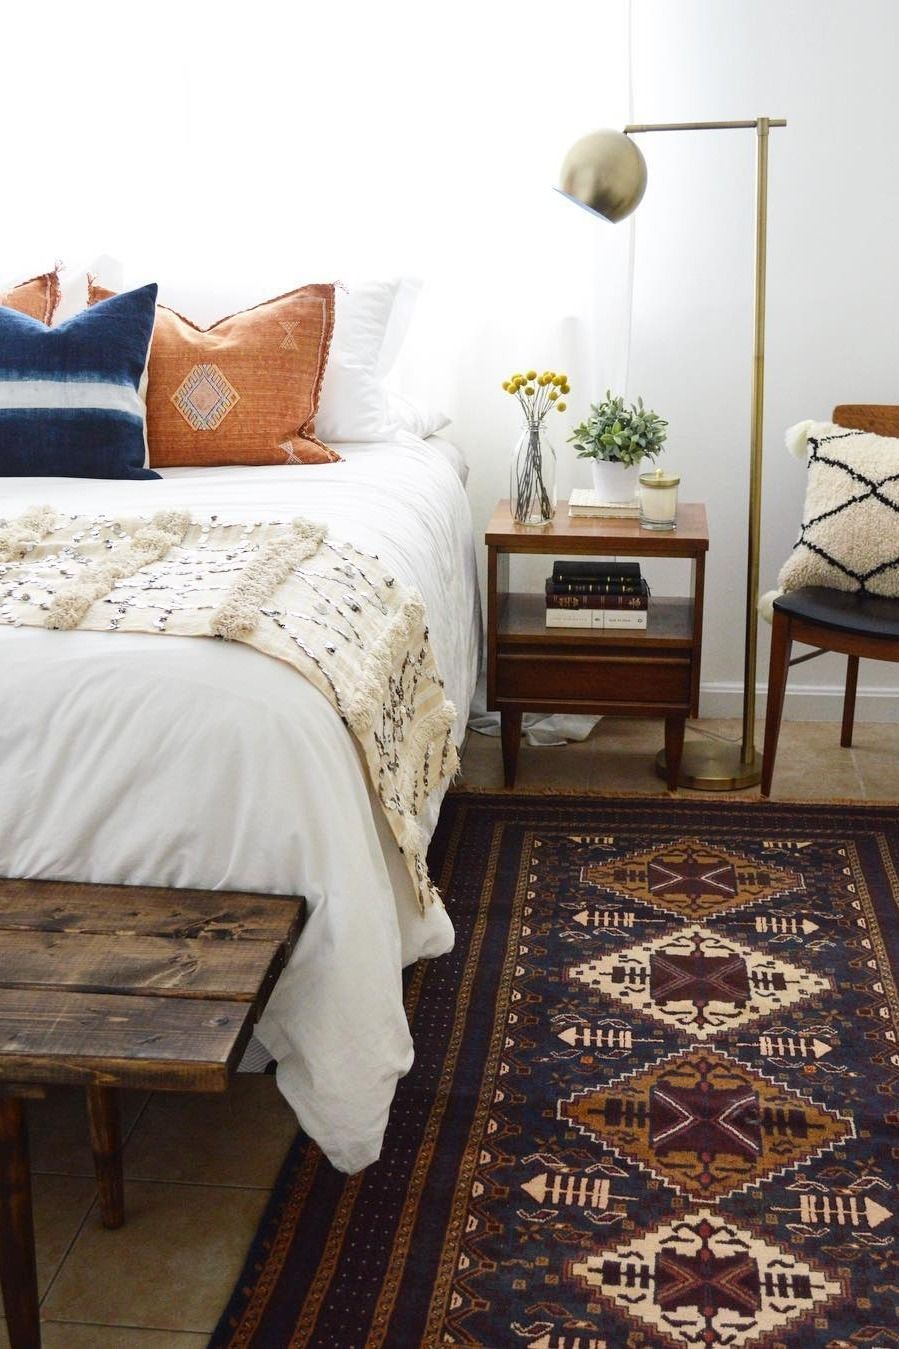 Pin van Grace Parnell op dream room | Pinterest - Slaapkamer ...